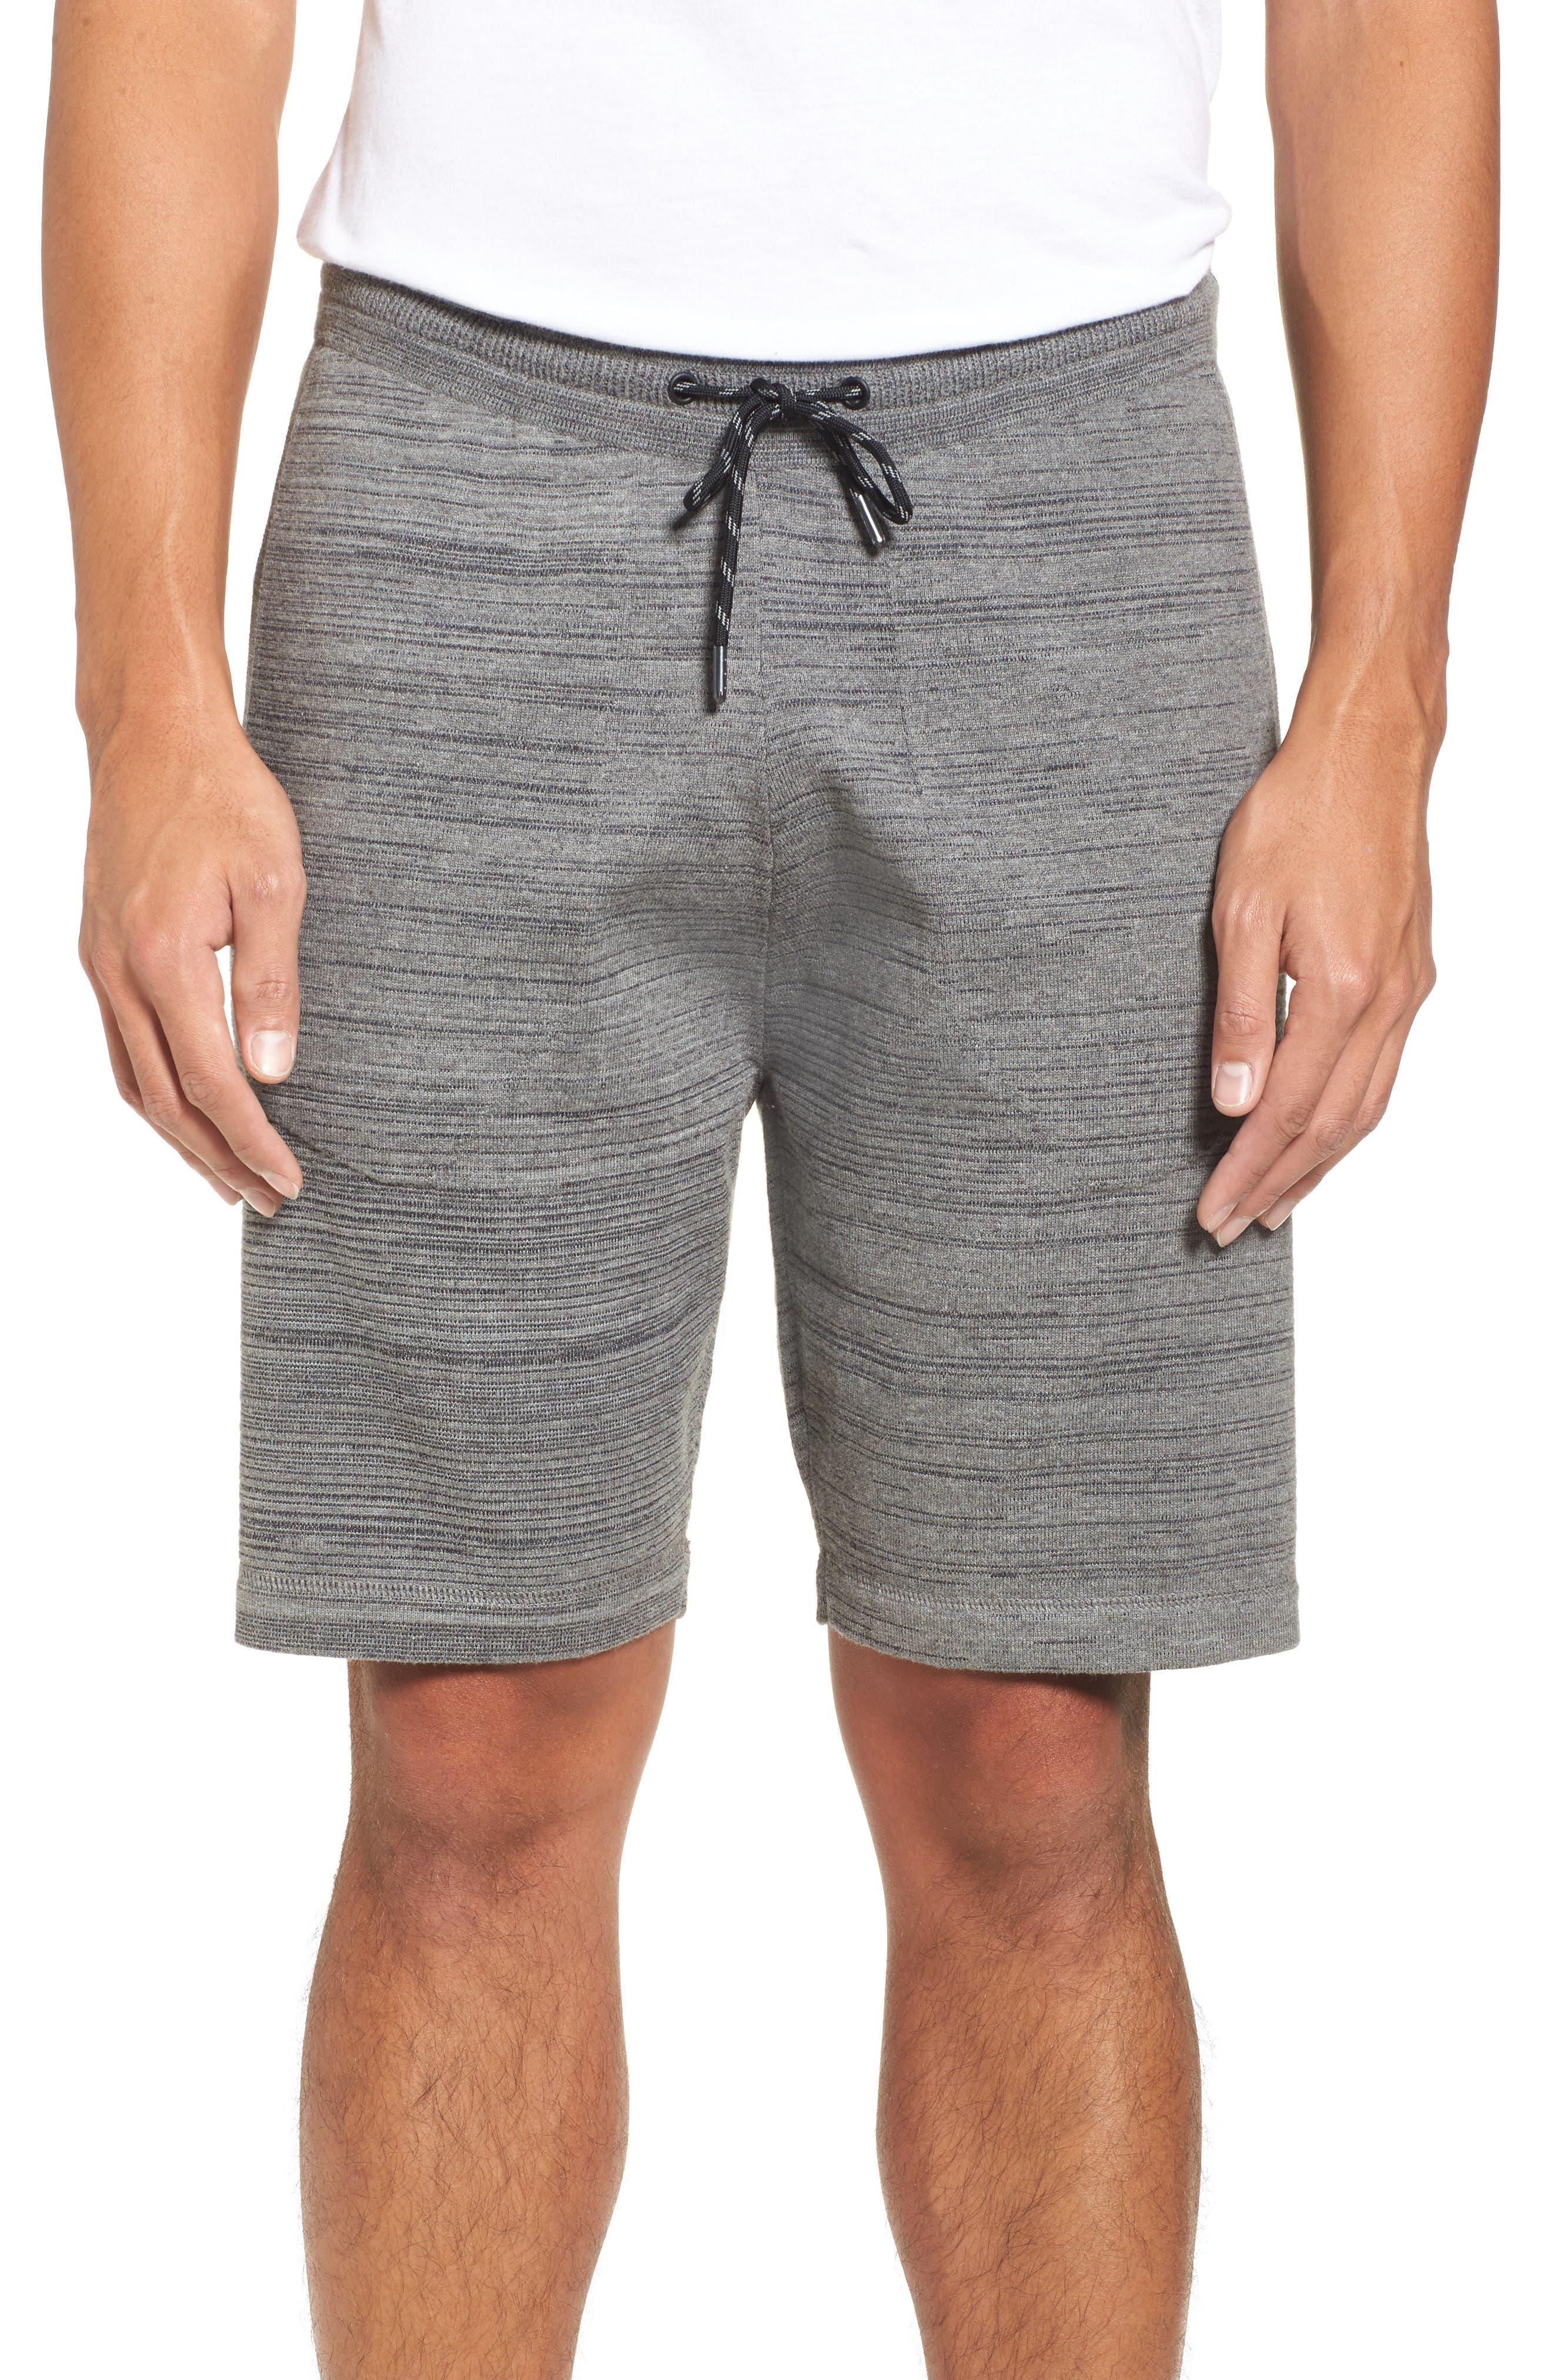 Tech Shorts,                         Main,                         color, Grey Obsidian Spacedye